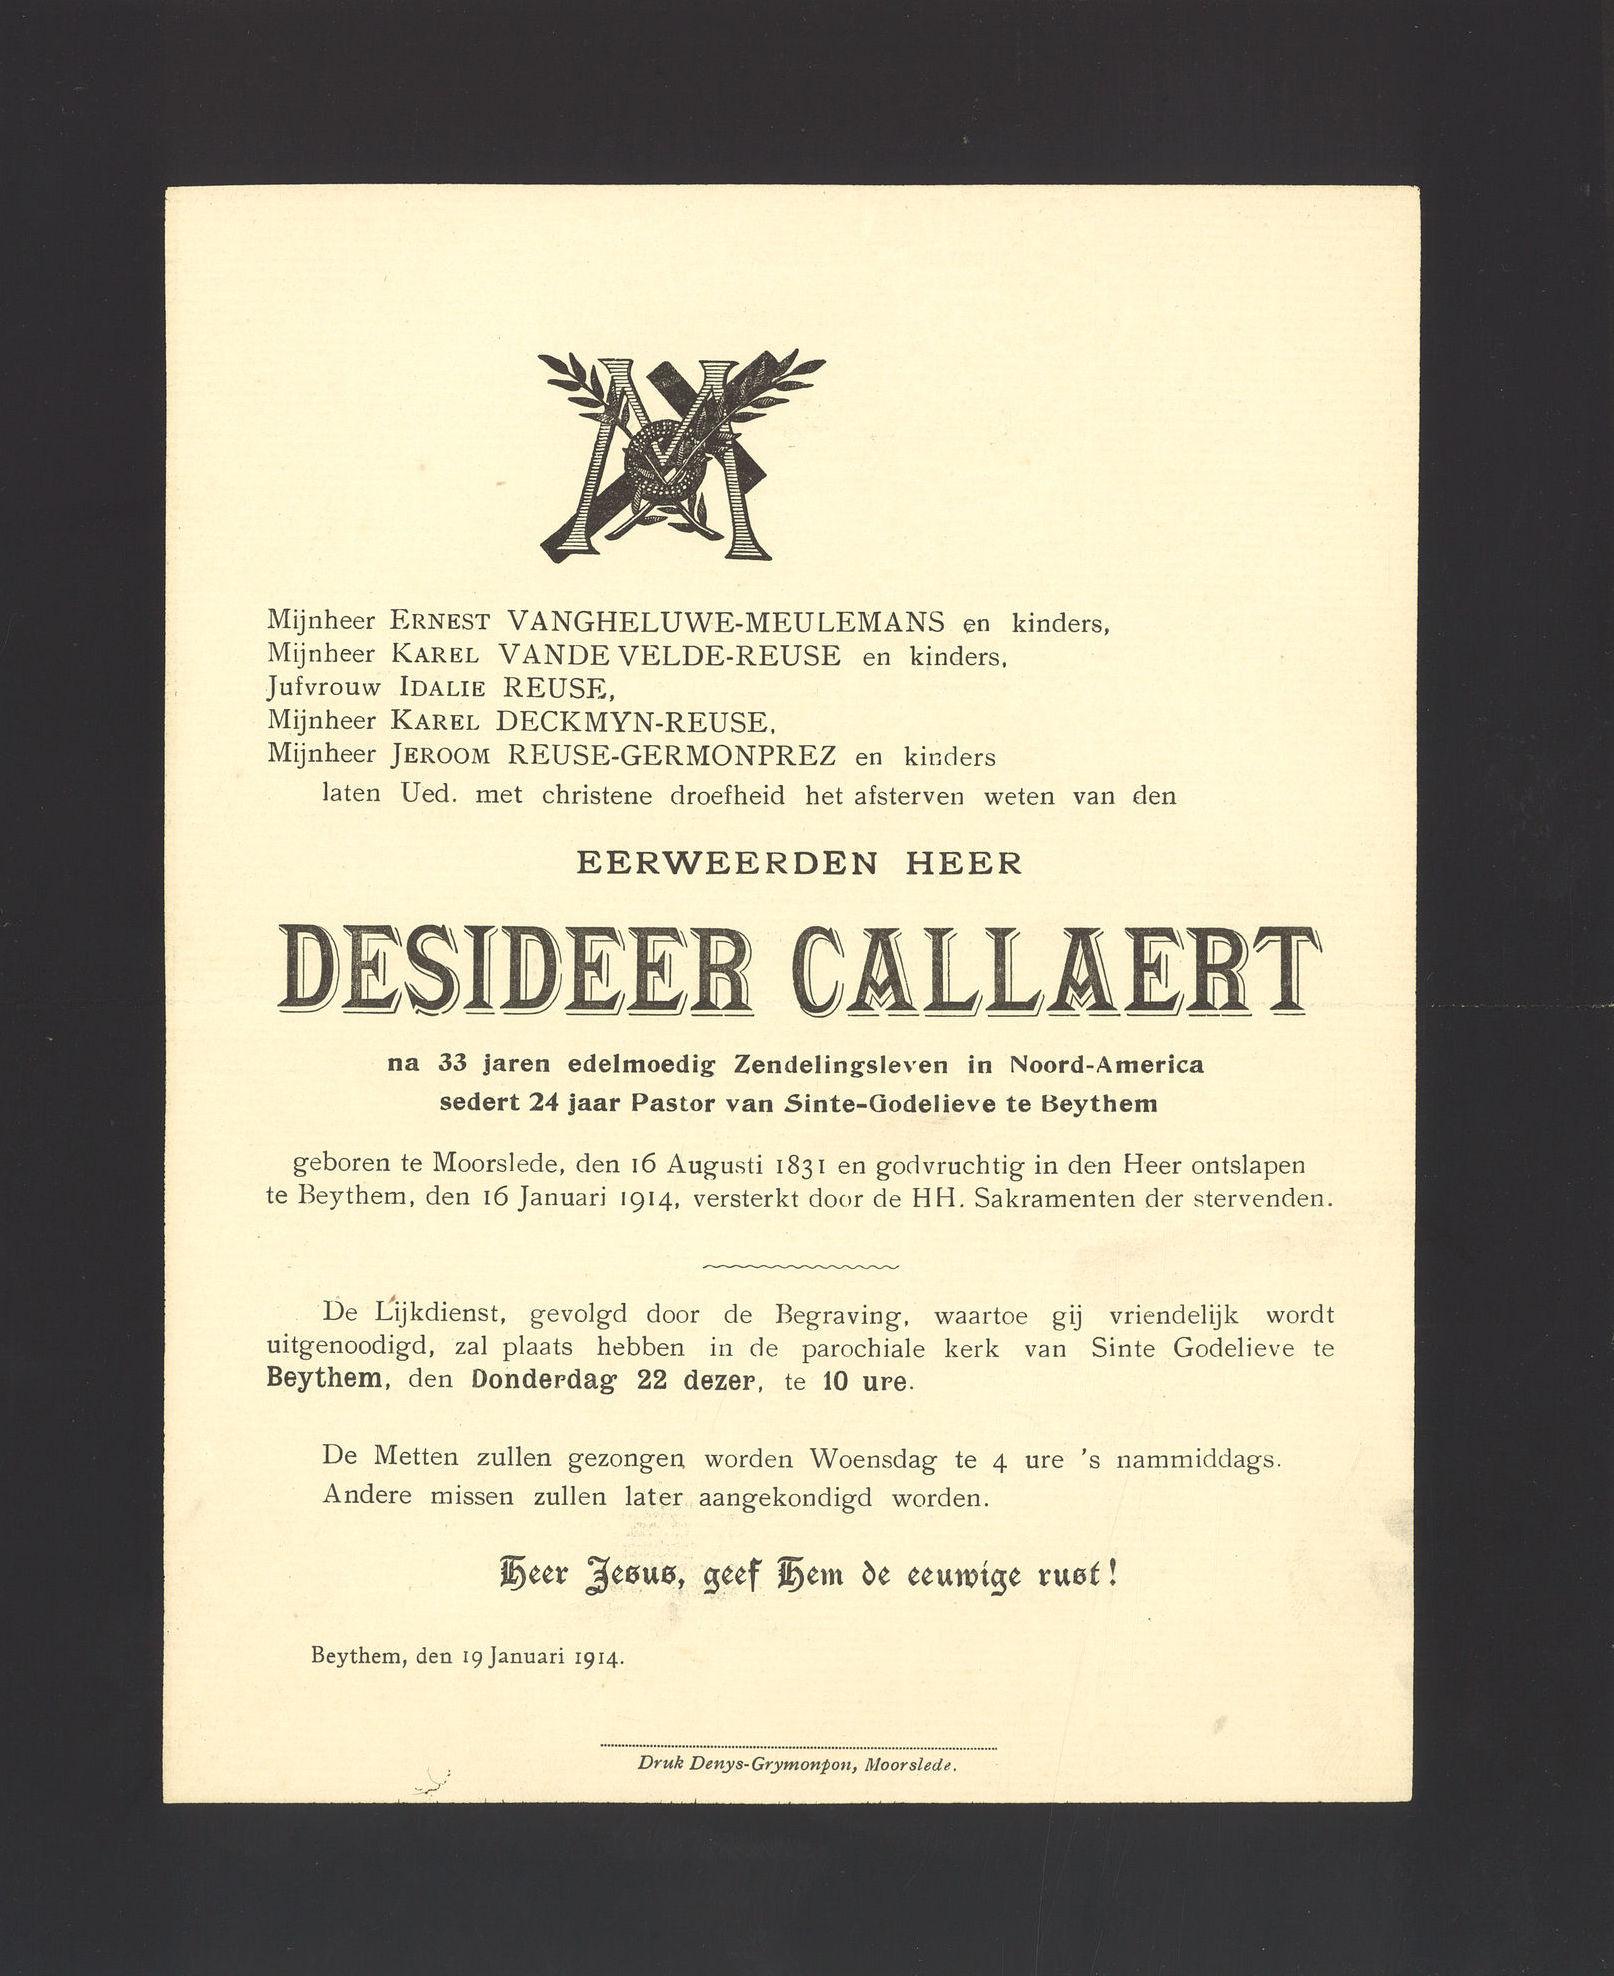 Desideer Callaert